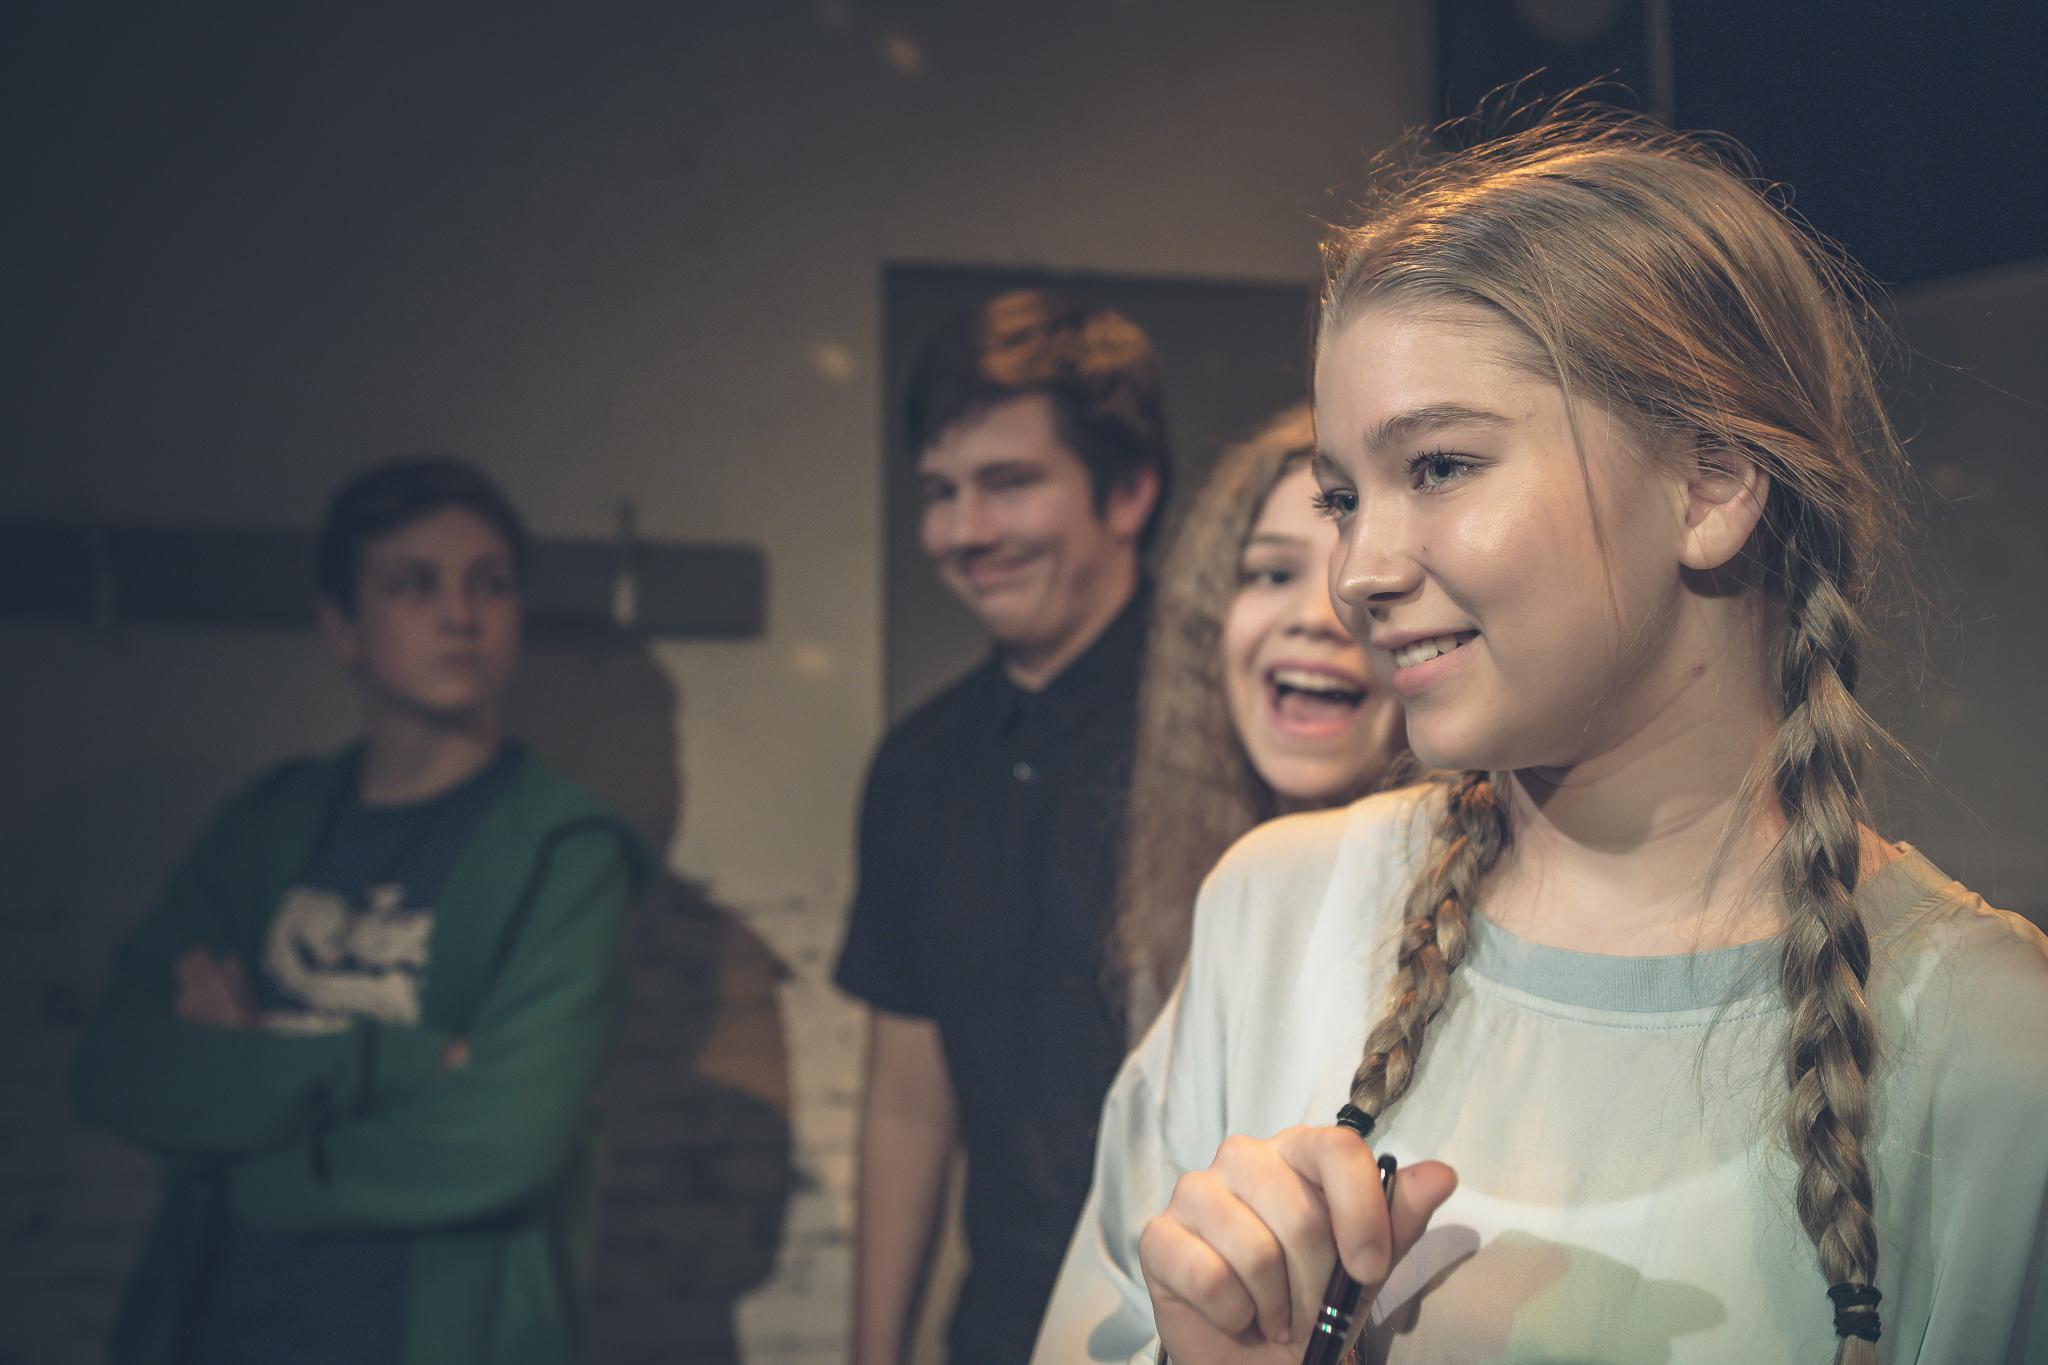 Jesse / Leevi Flinkman, Matias / Rony Kaiskola, Karoliina / Seela Moilanen, Jenni / Enna Piitulainen